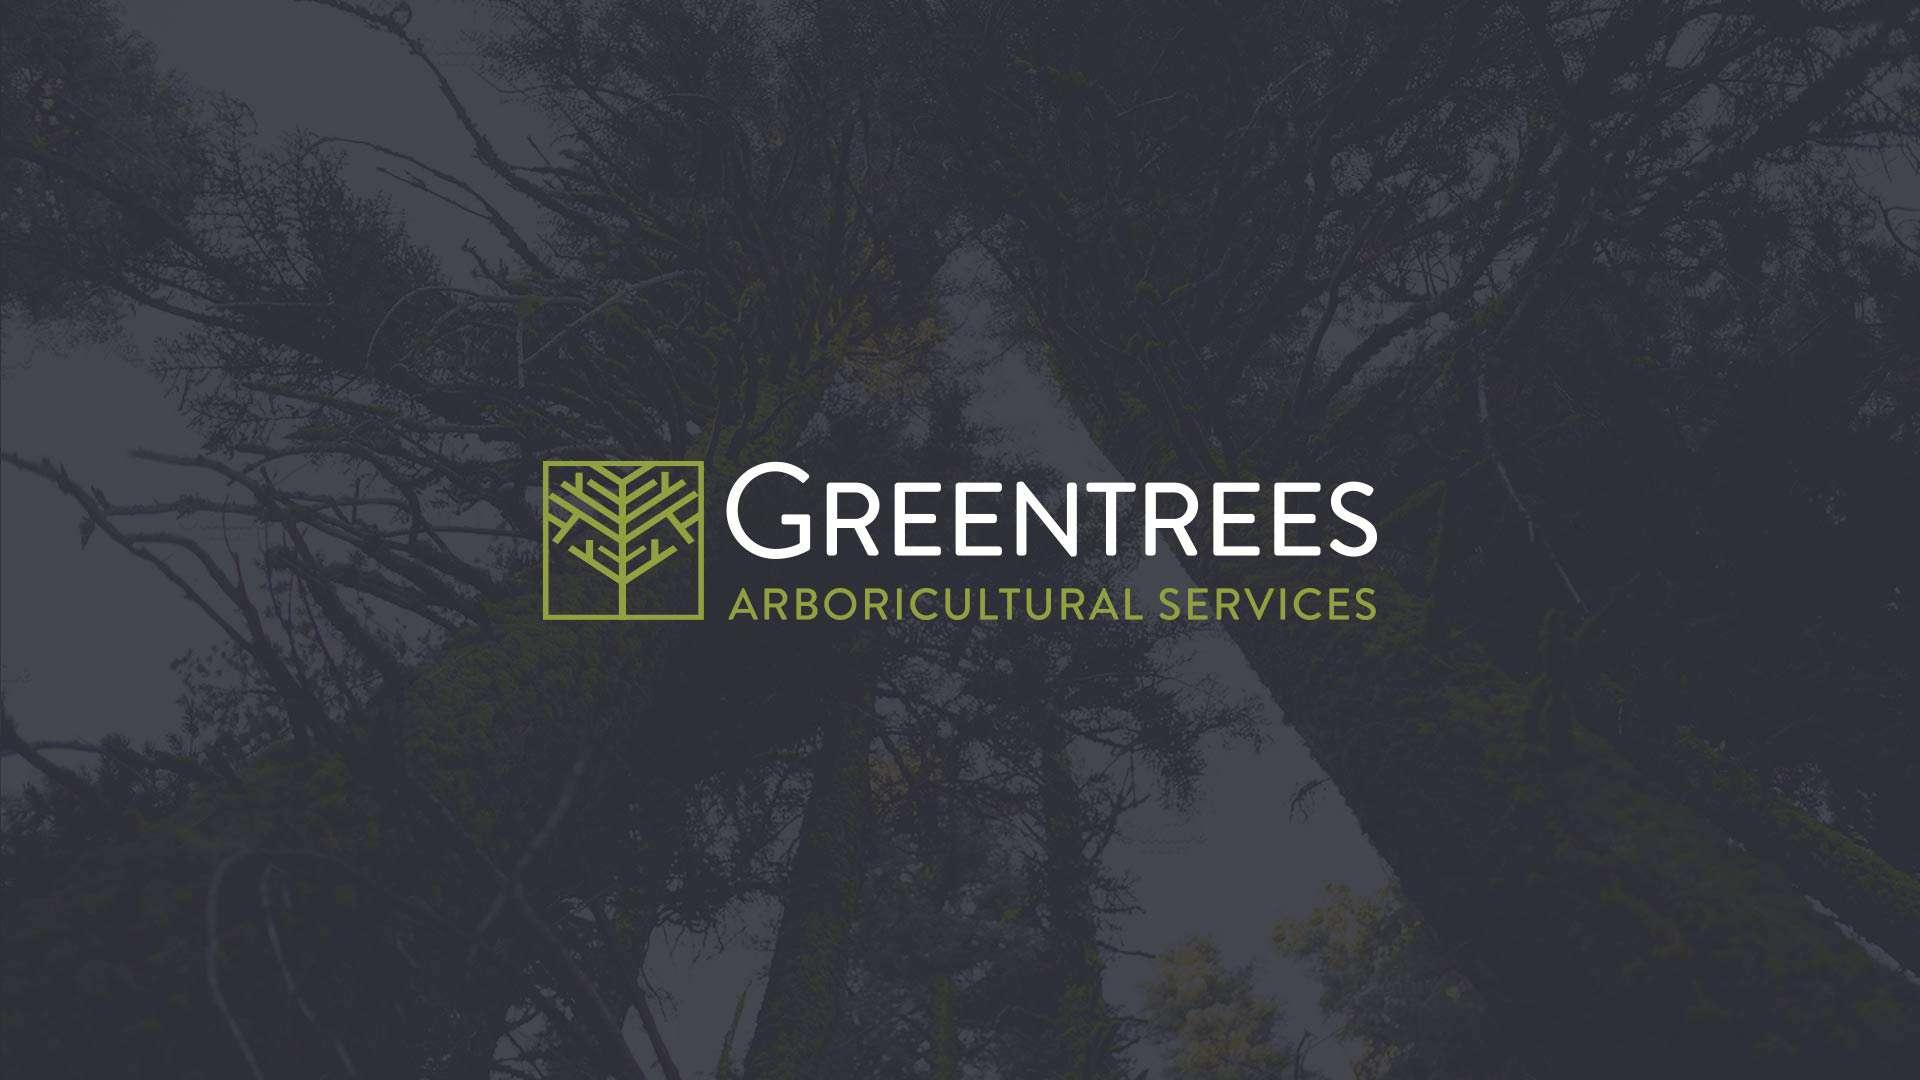 greentrees-logo2